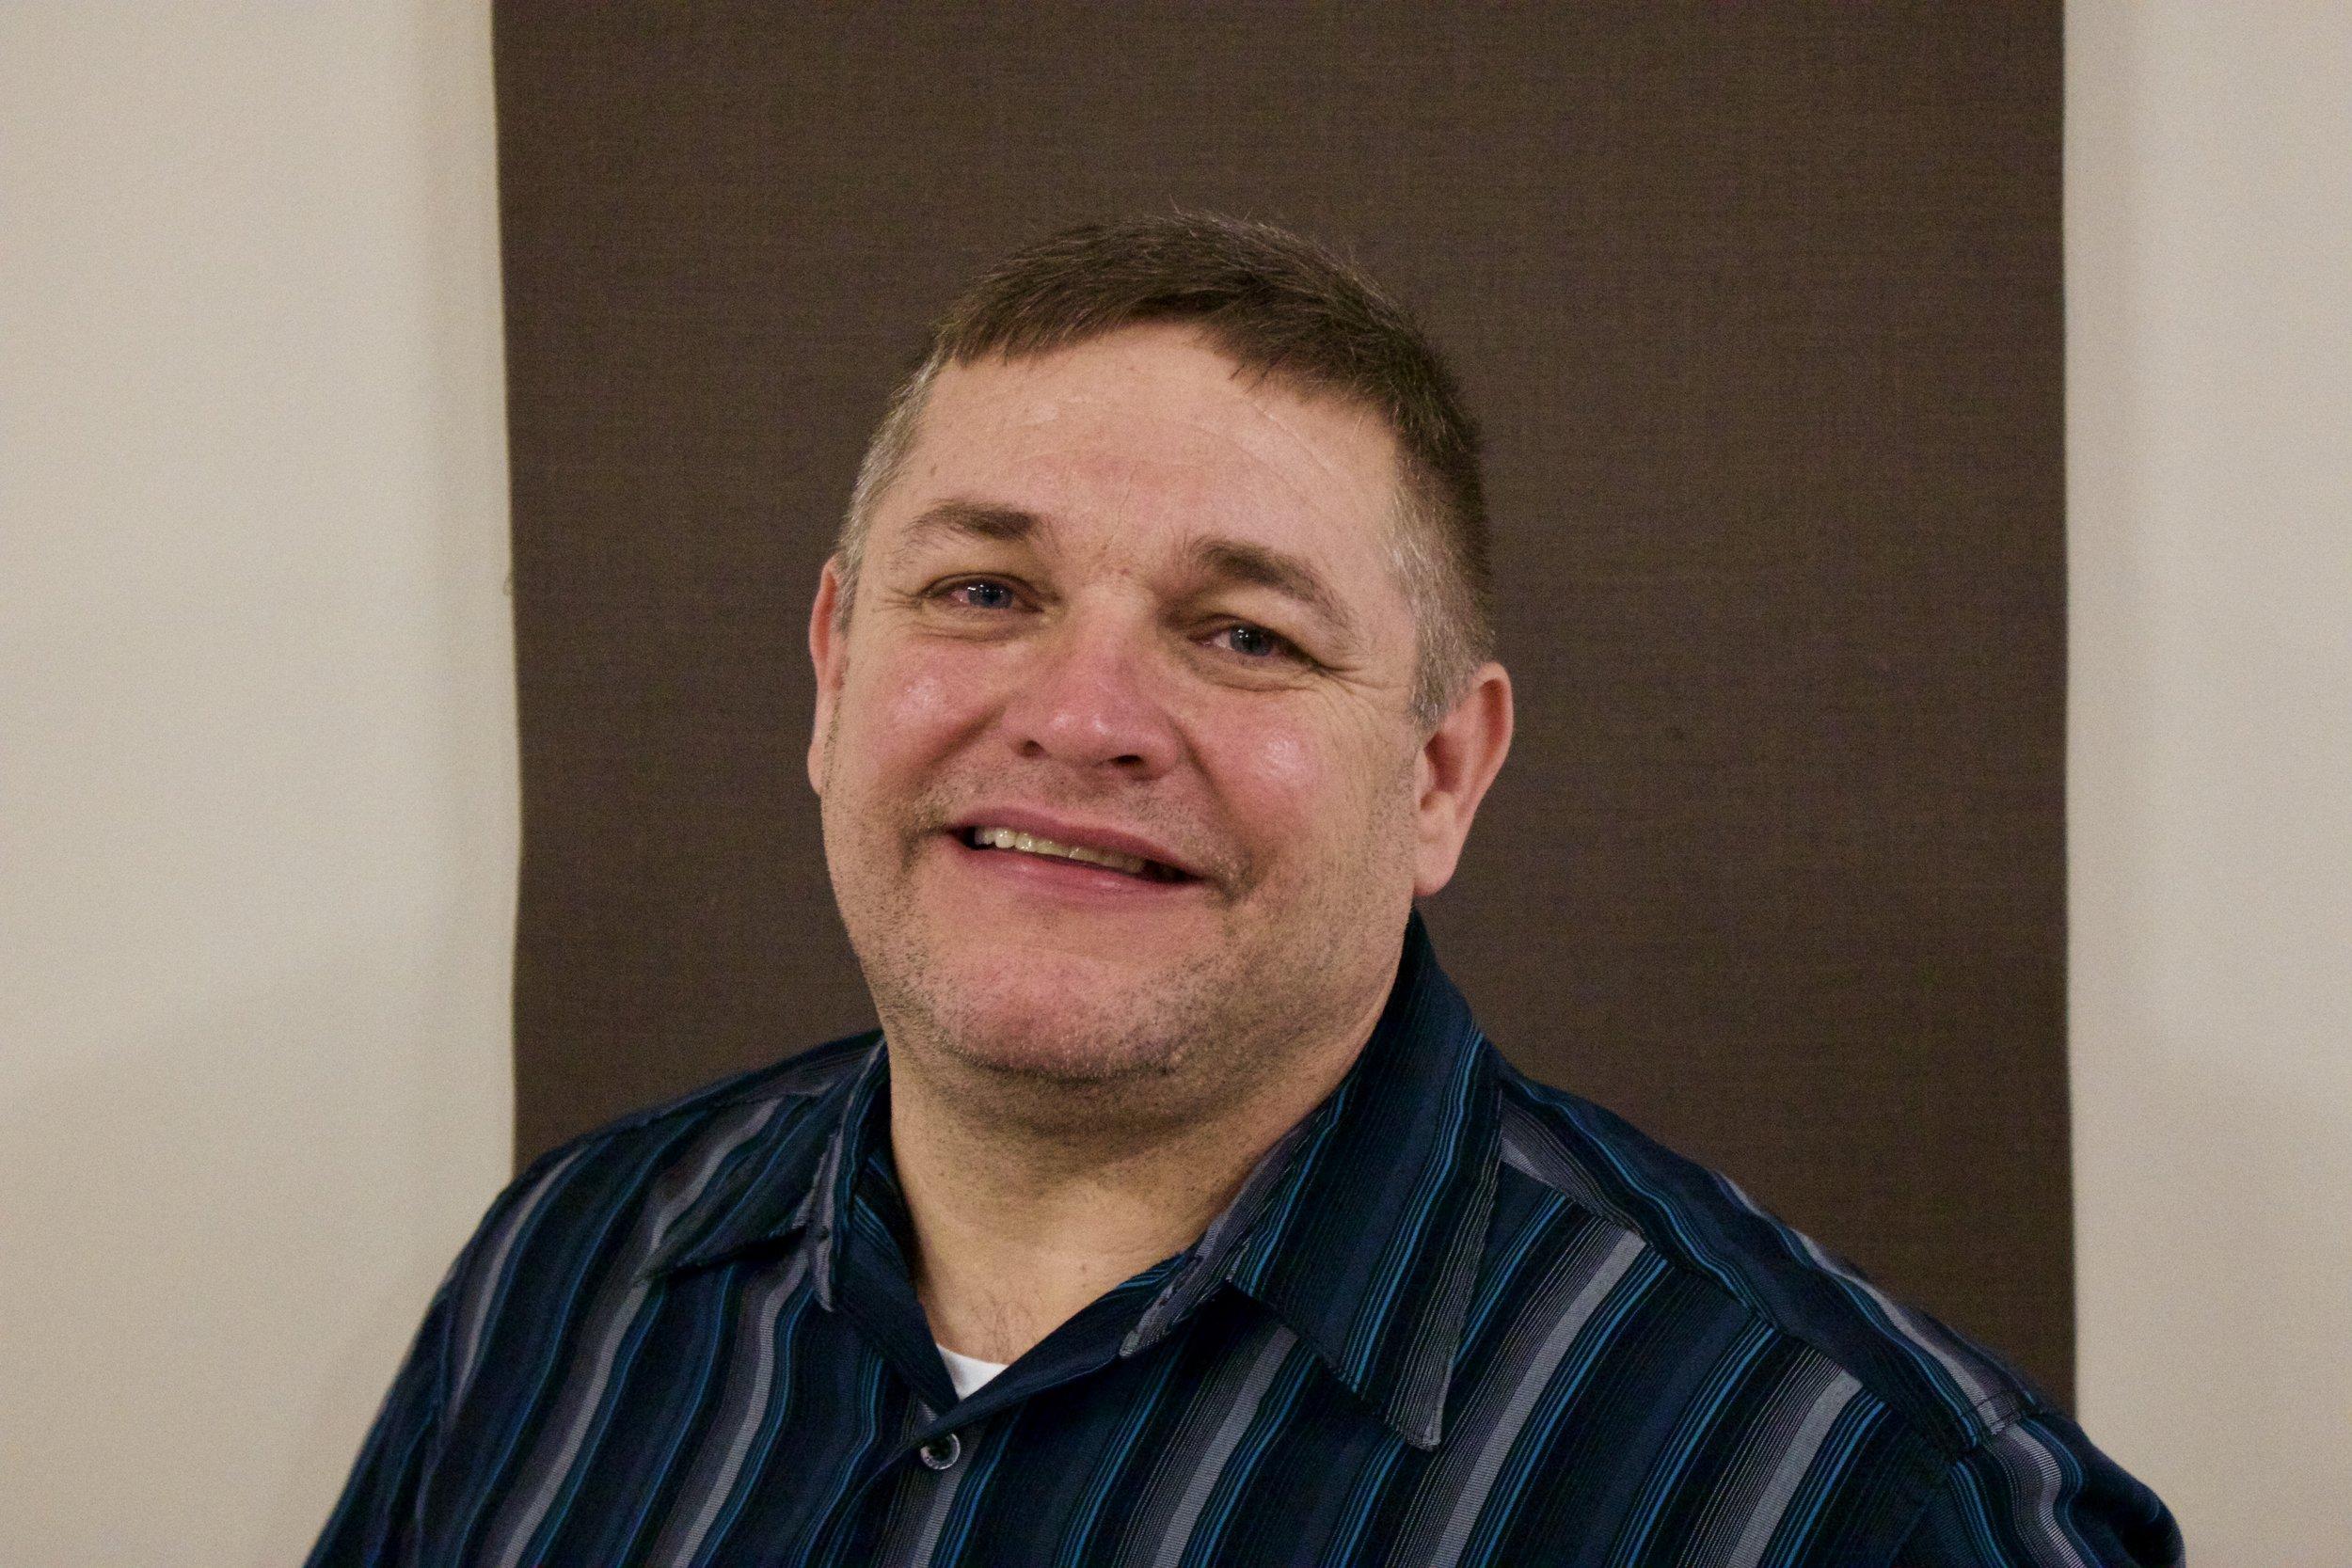 Paul Crosby: Pastor of RHDC Church